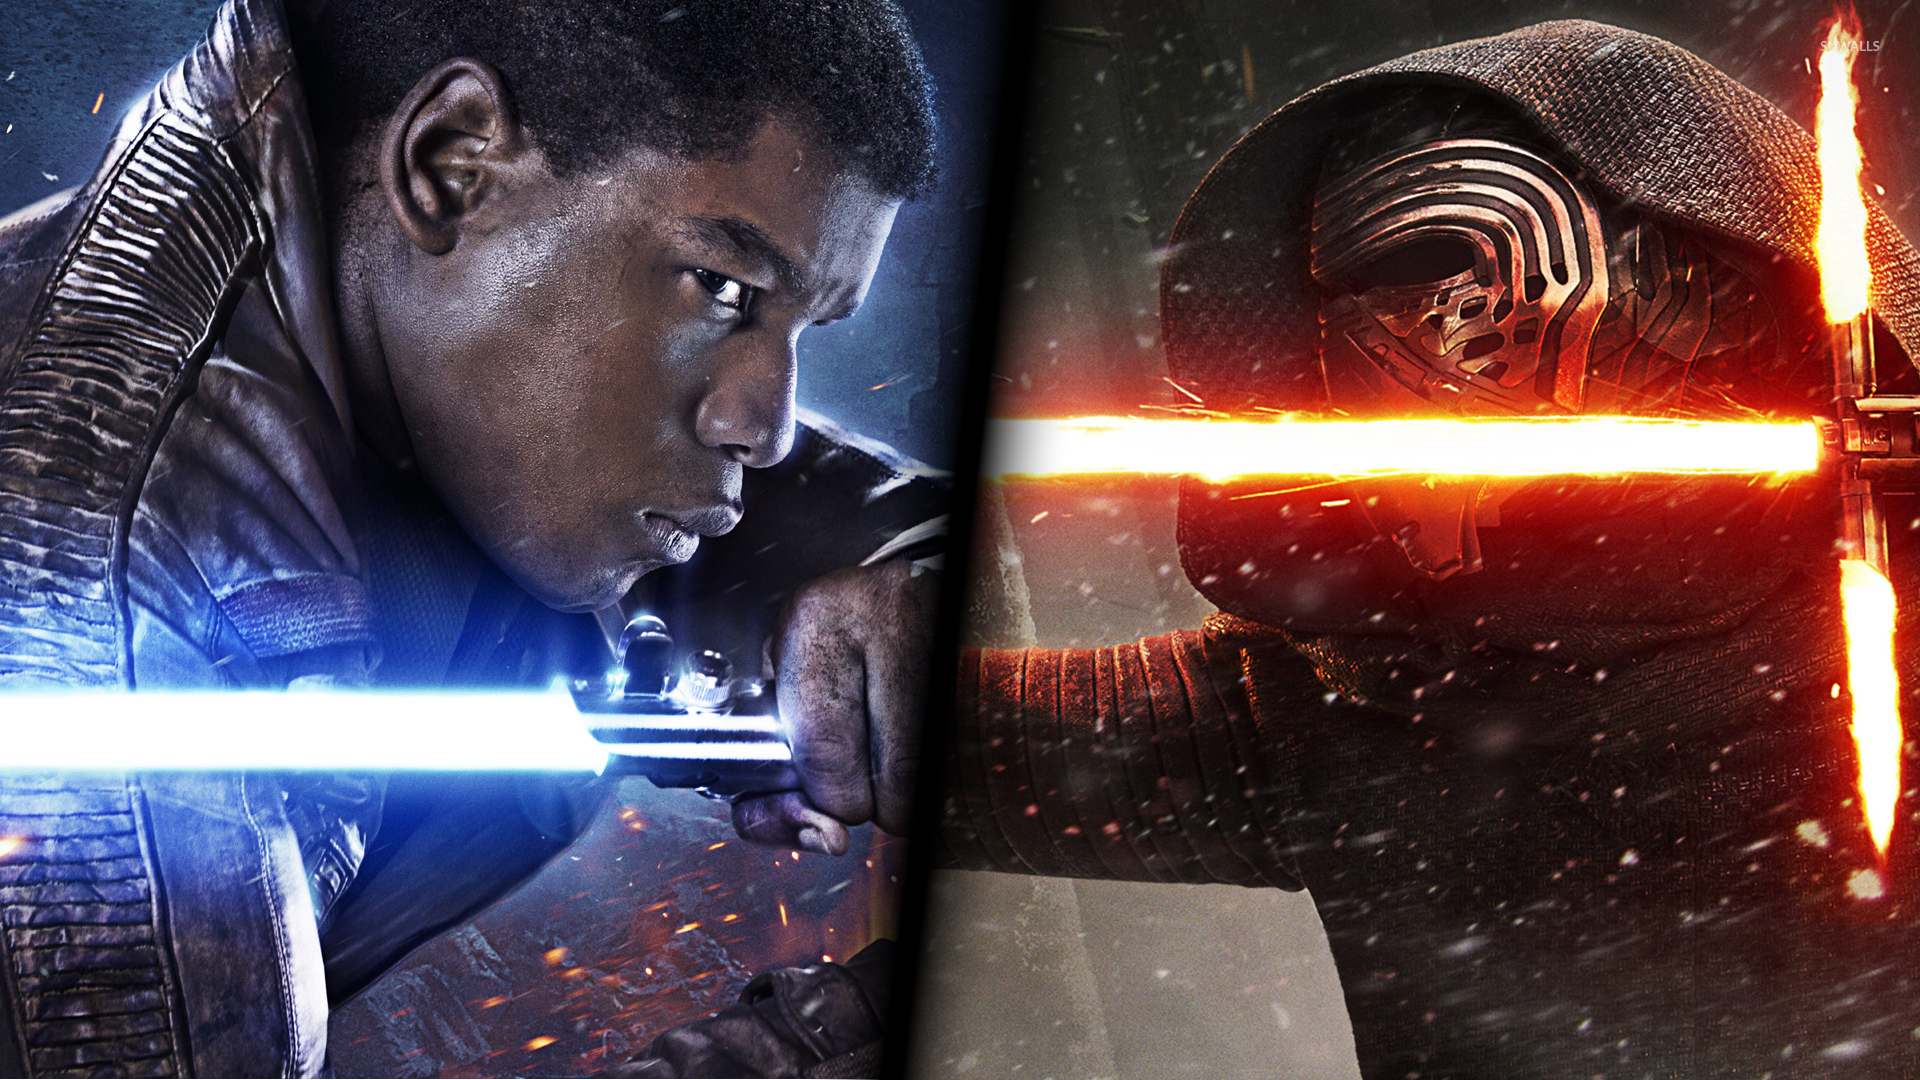 Free Download Kylo Ren In Star Wars The Force Awakens Wallpaper